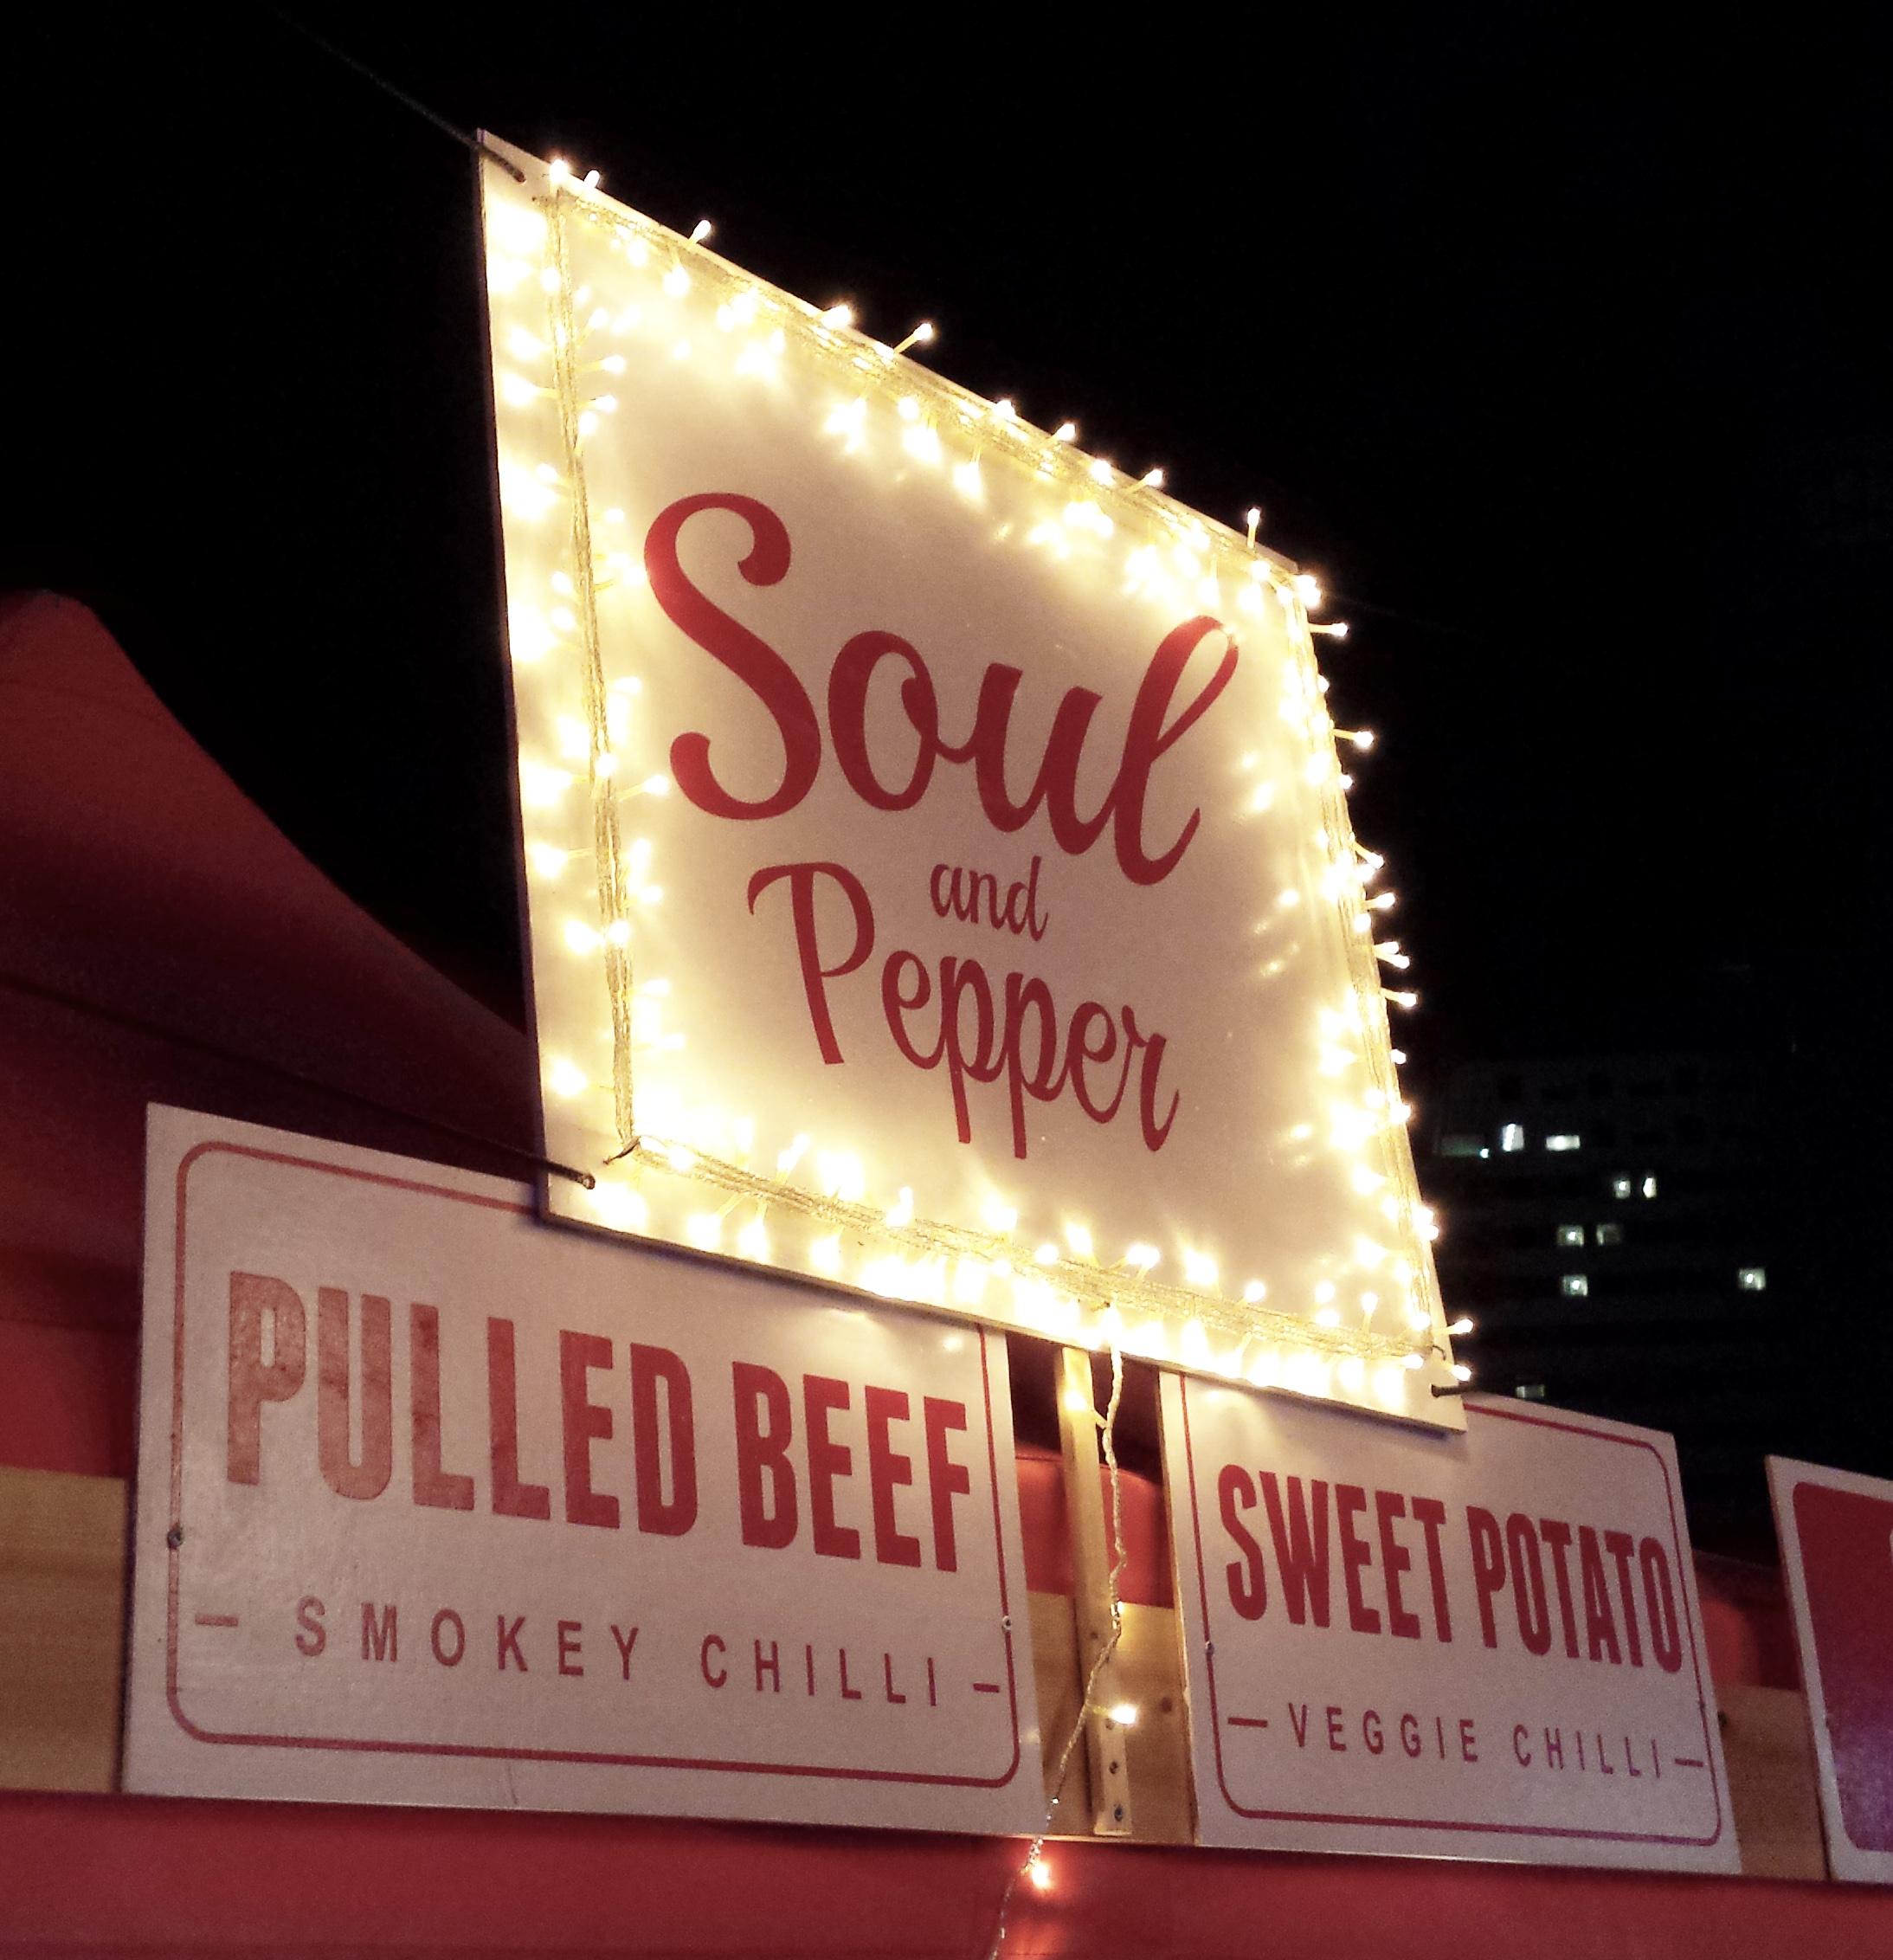 street food sign hire lights american.jpg